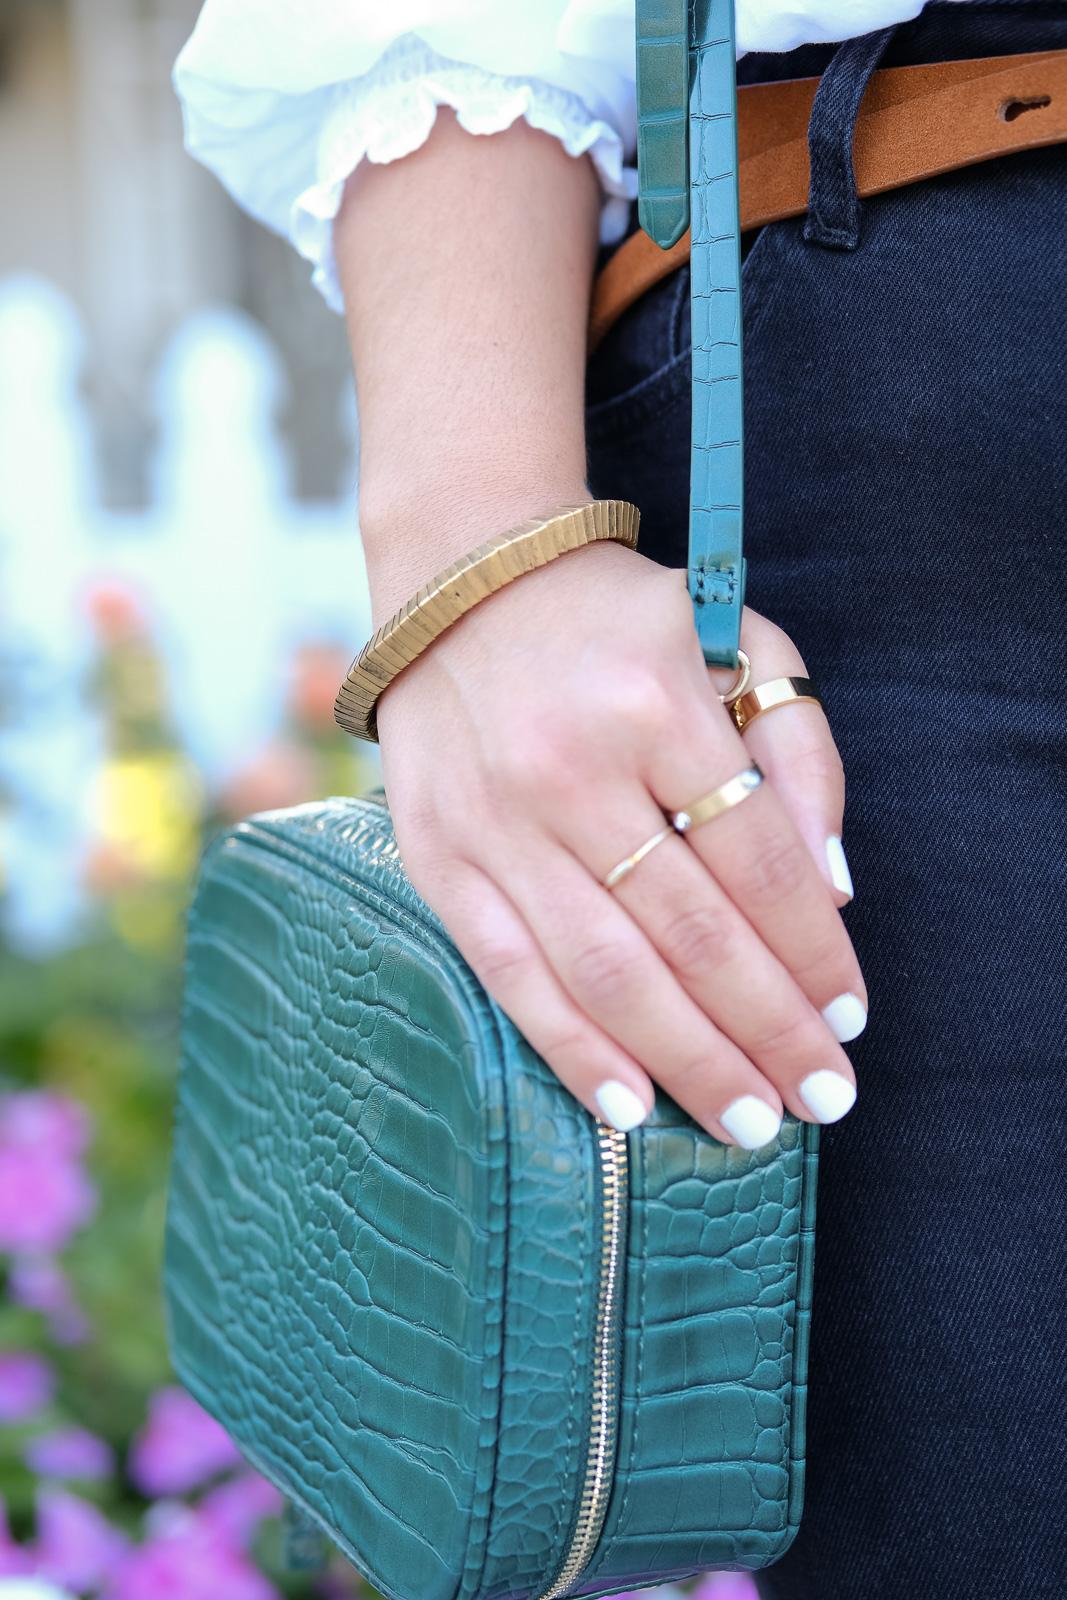 Green bag layered jewelry